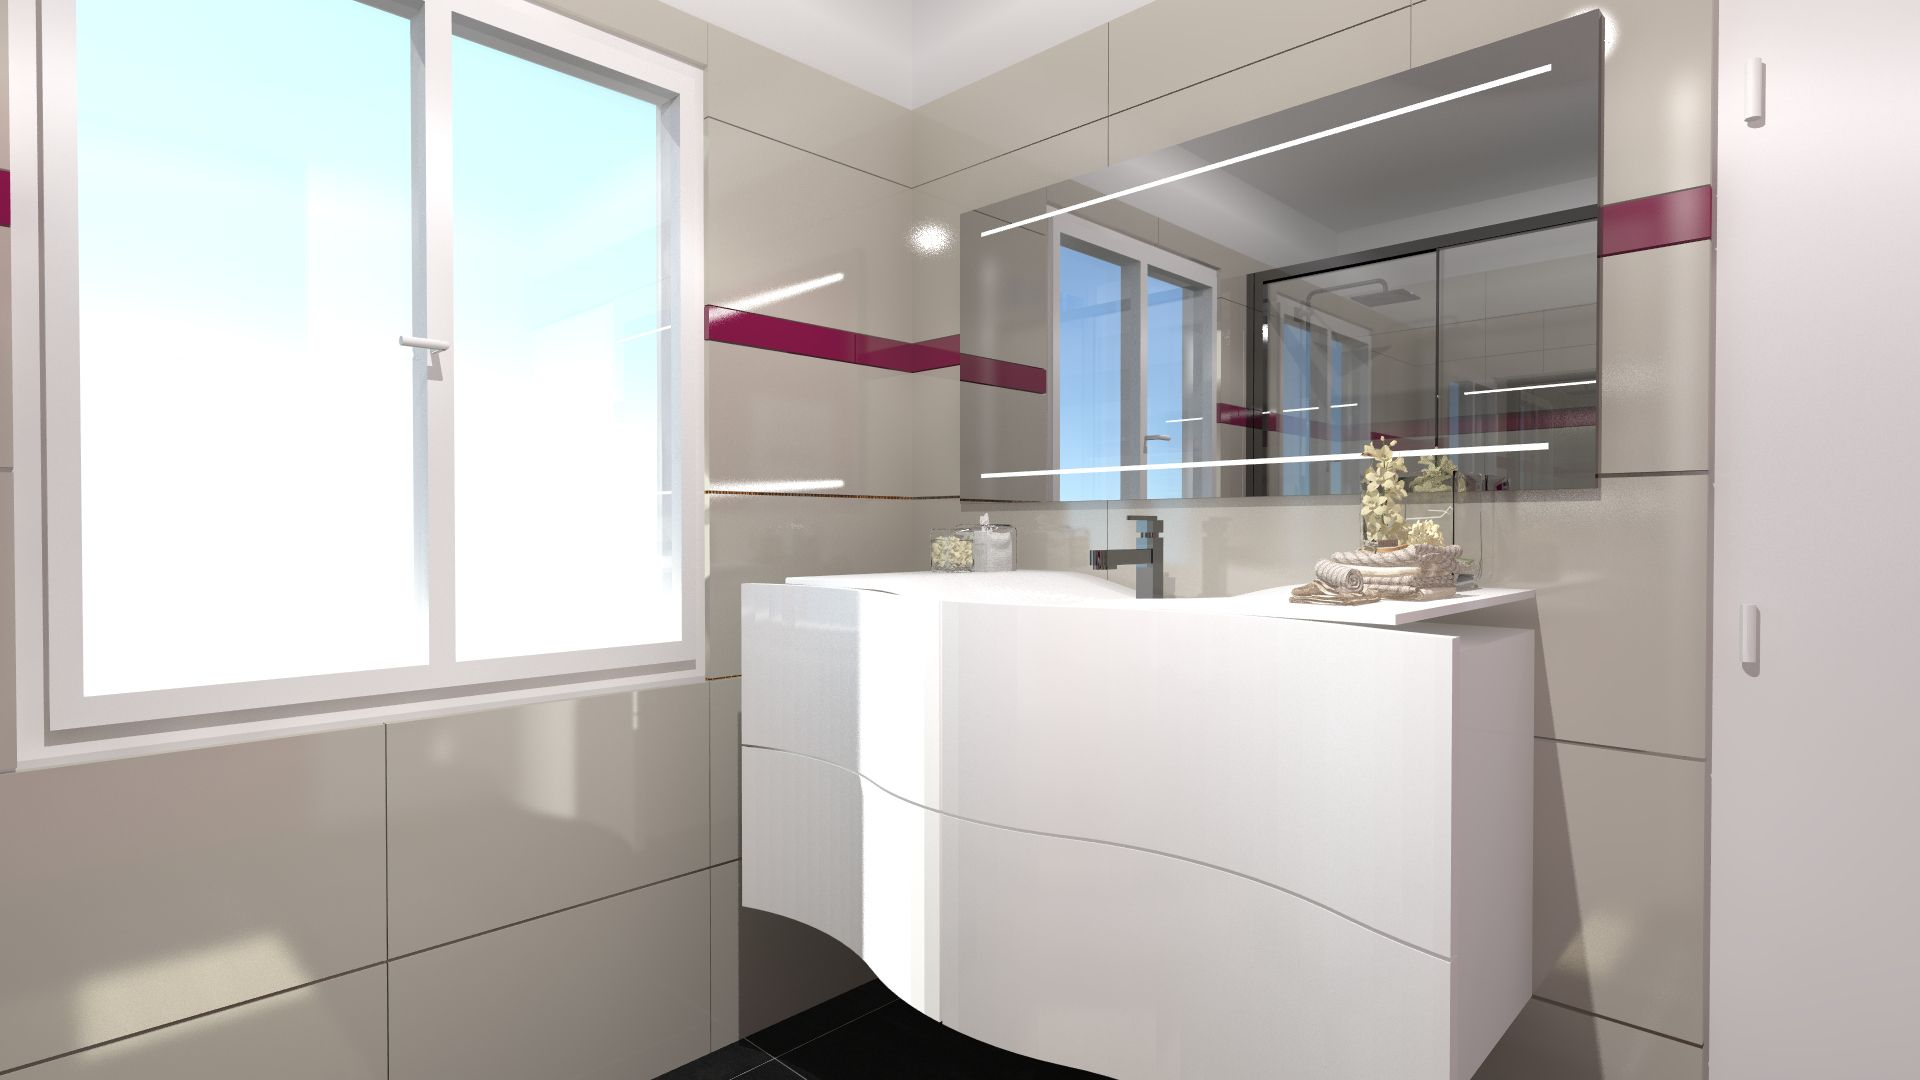 Salle De Bain Blanche Et Rose Fushia Realisation Ms Design Pinterest